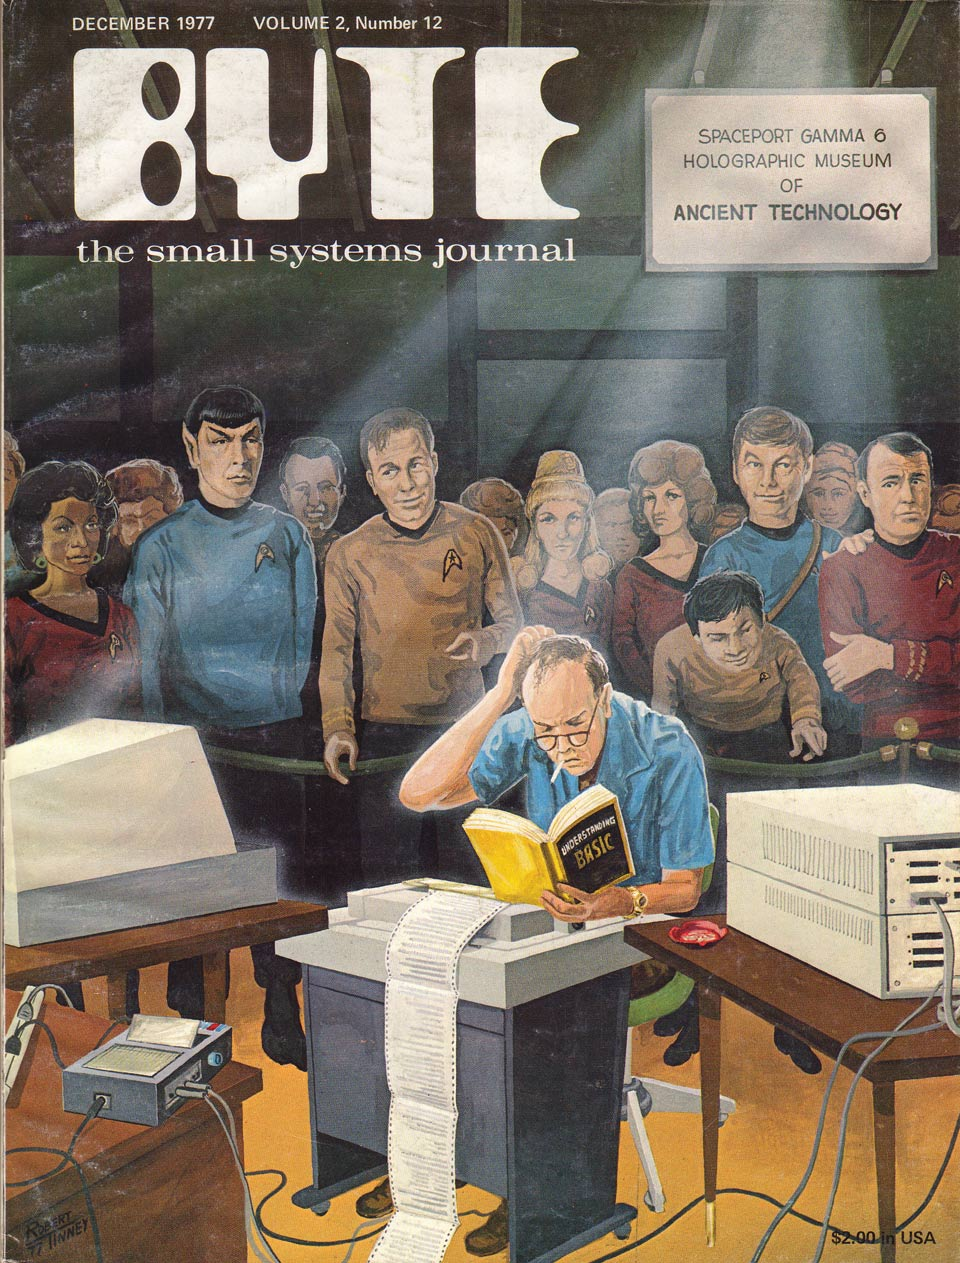 Cover of BYTE magazine - dec 1977